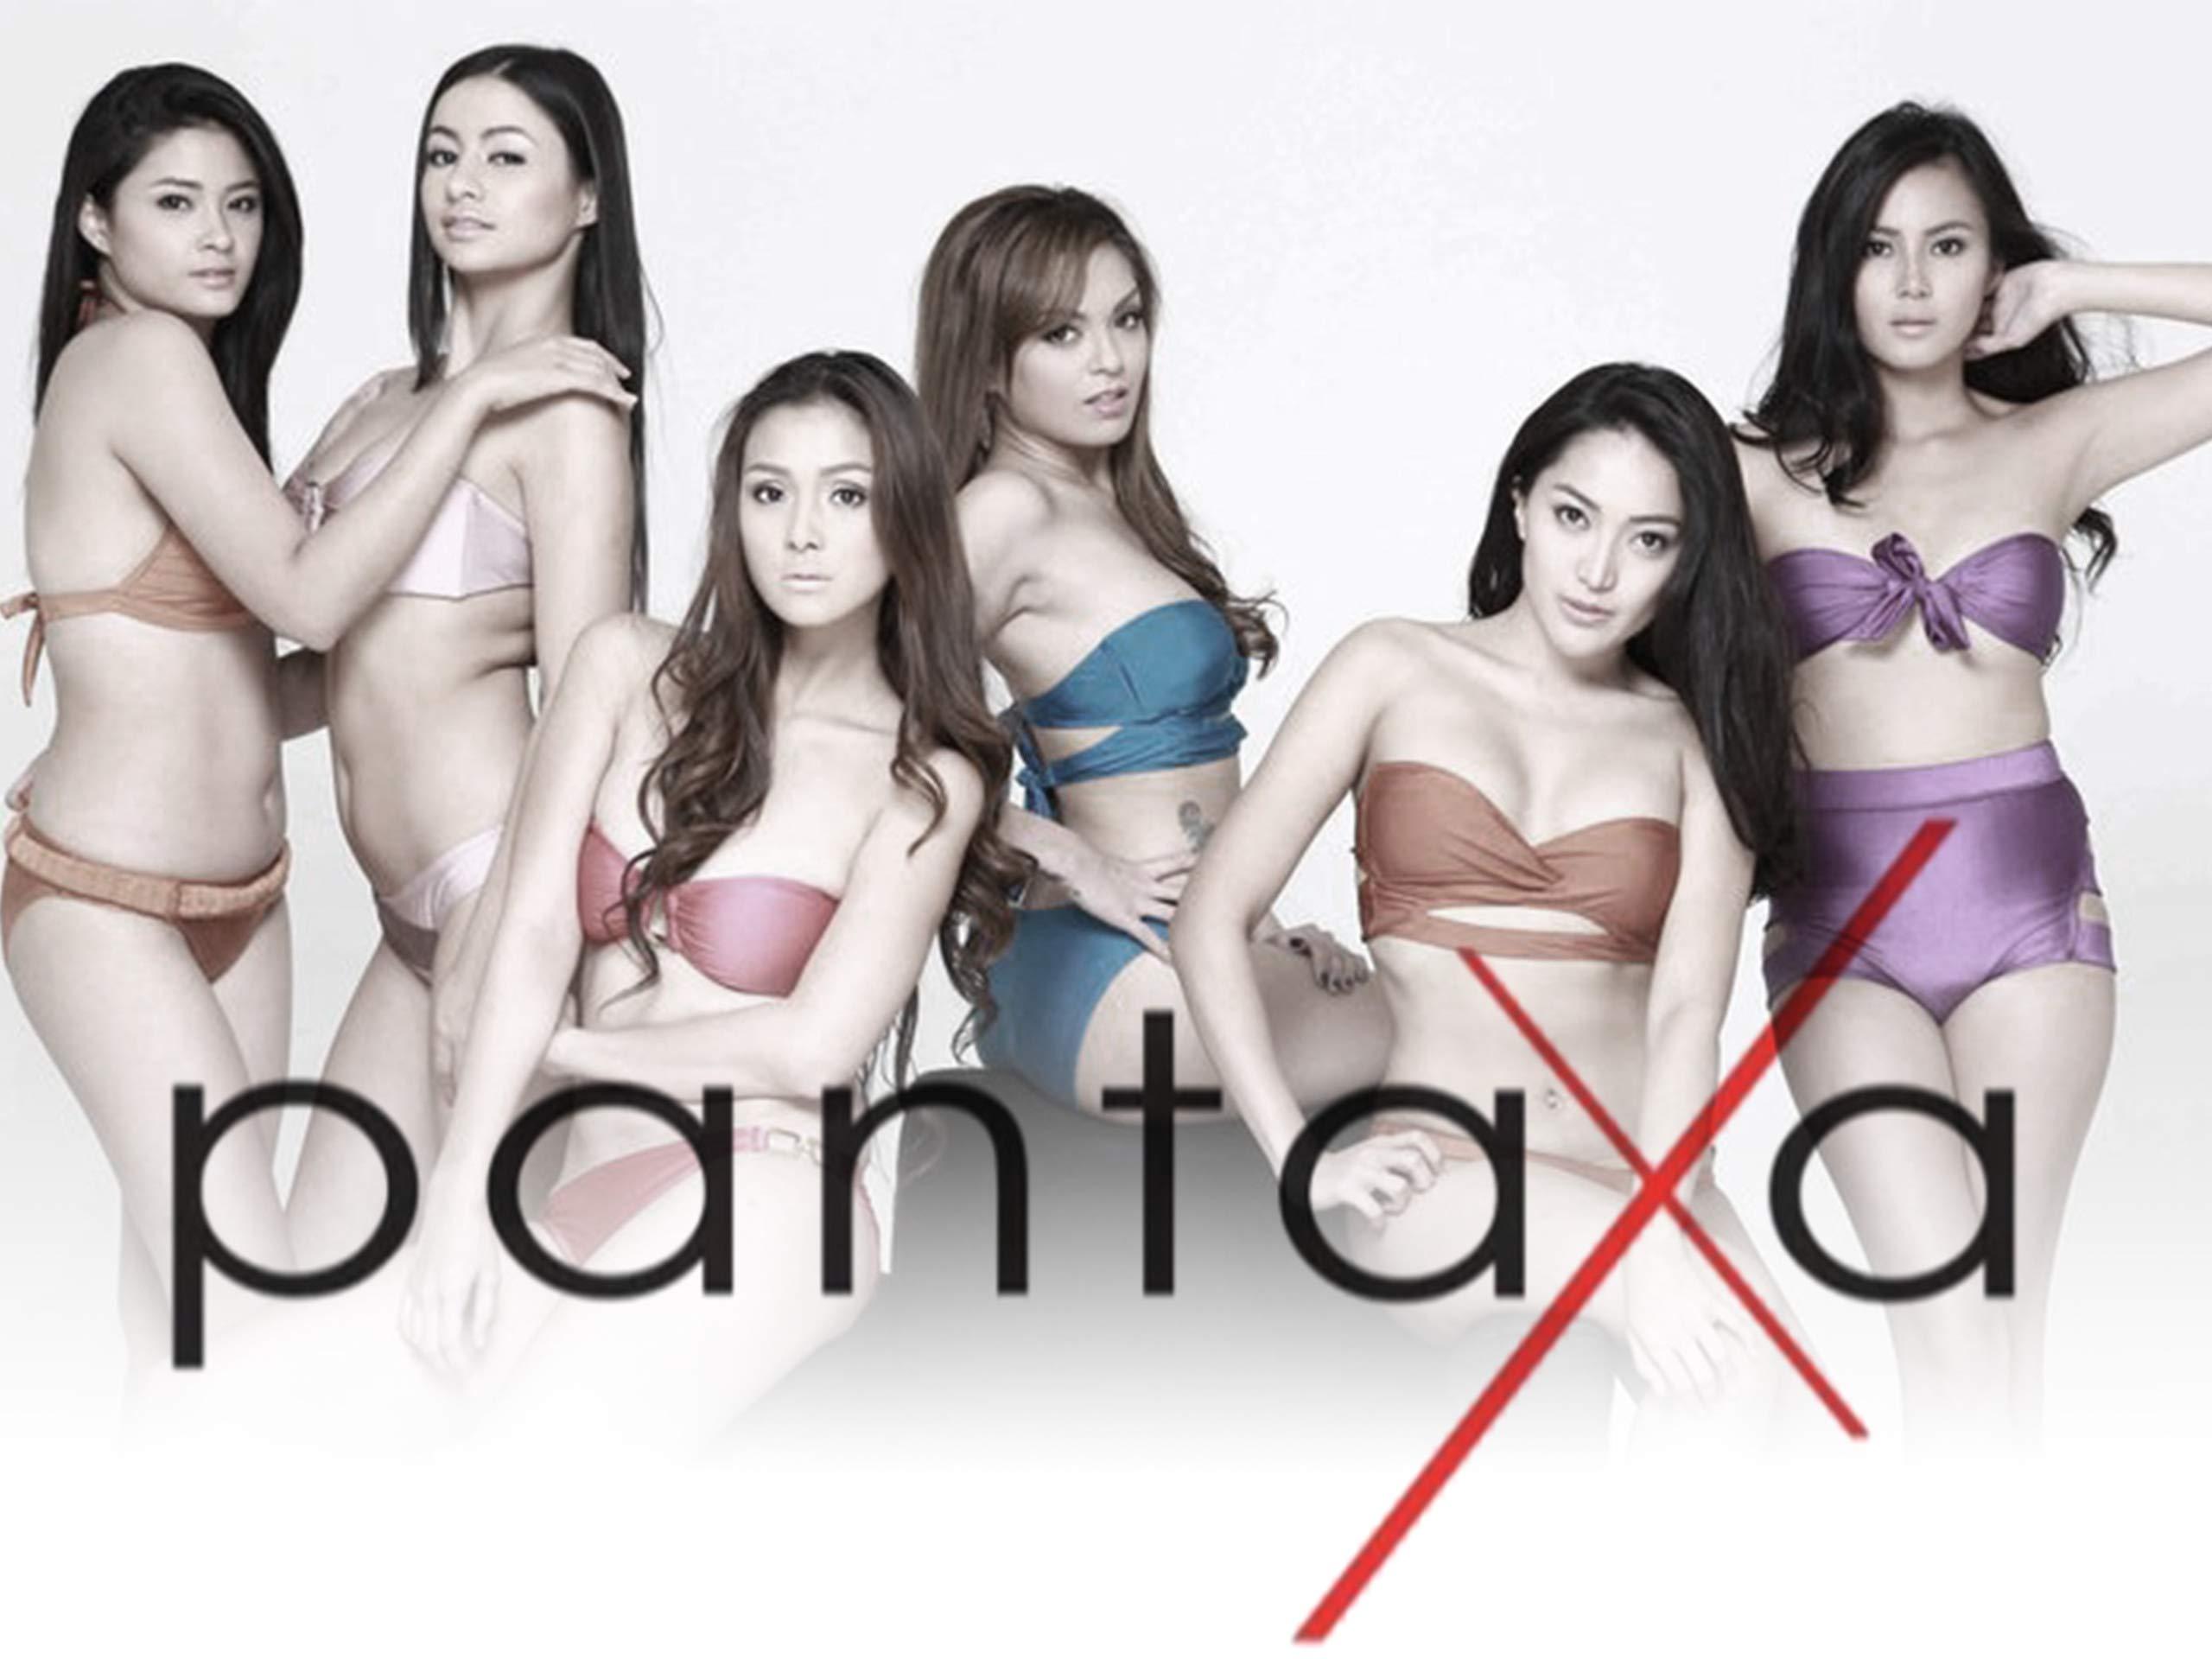 Image result for pantaxa season 1